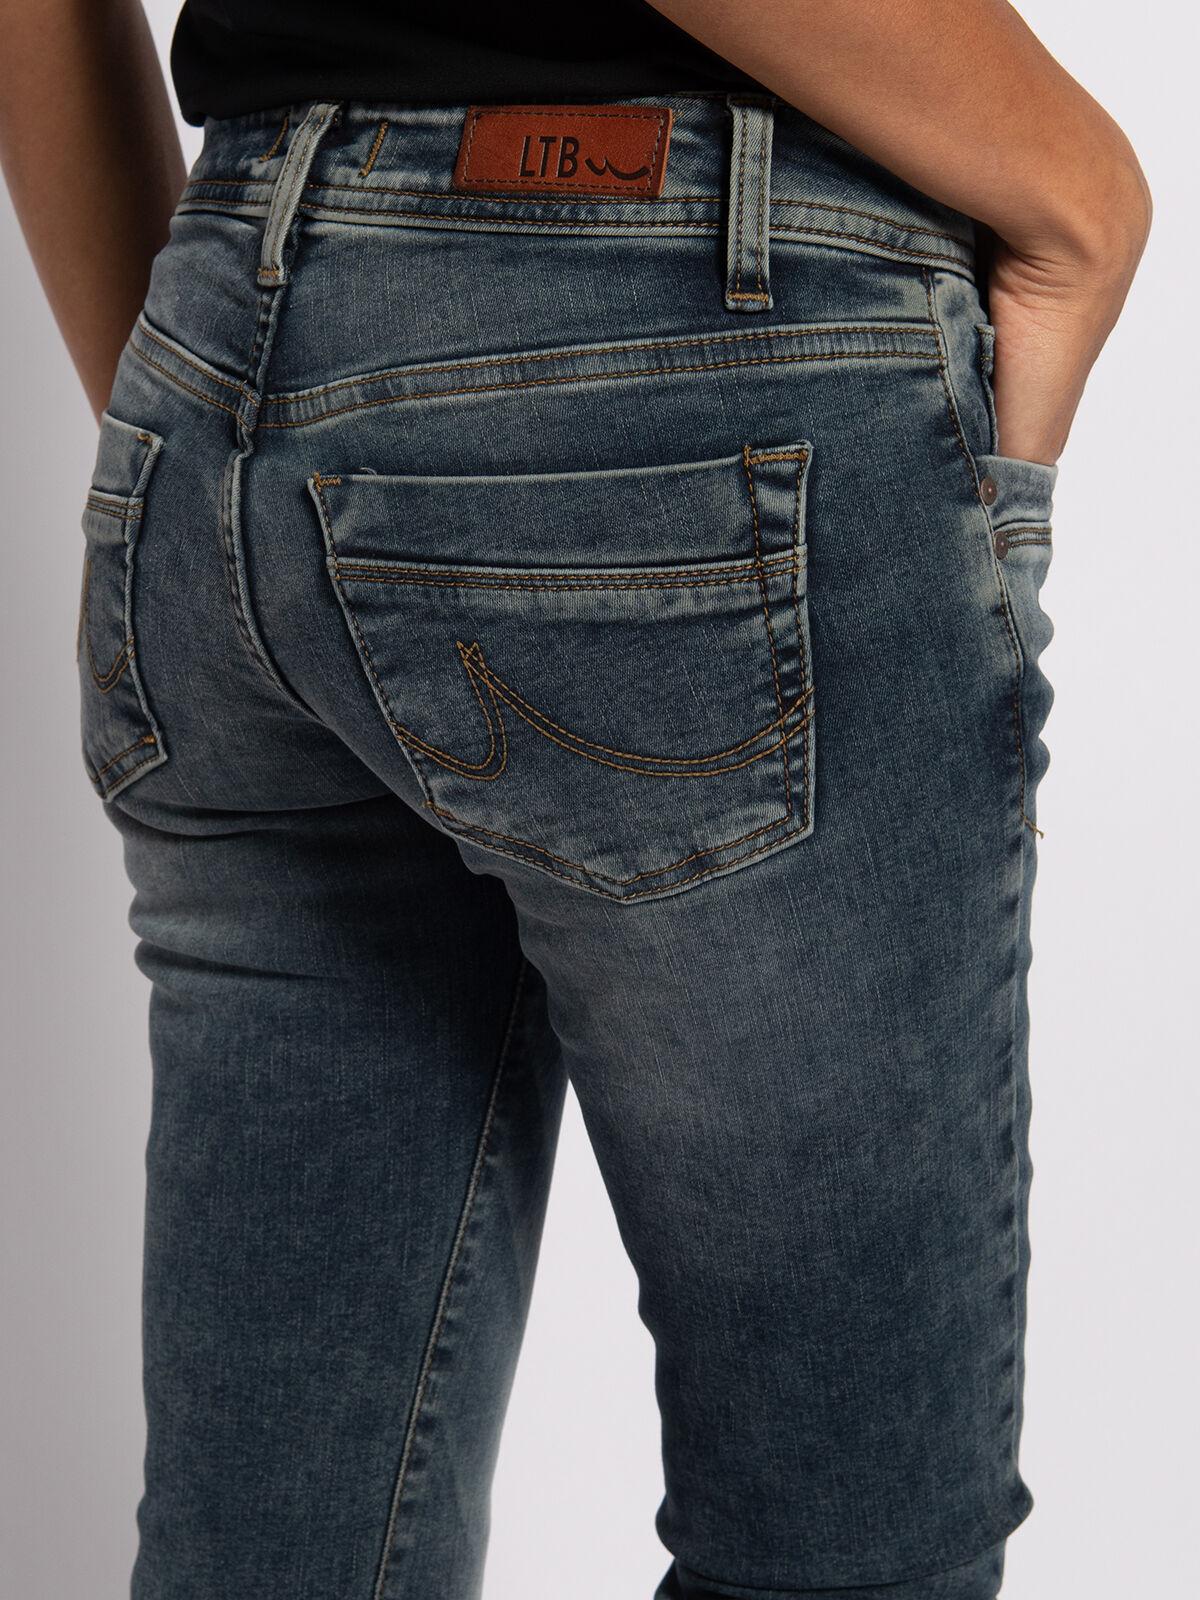 Valerie Jeans